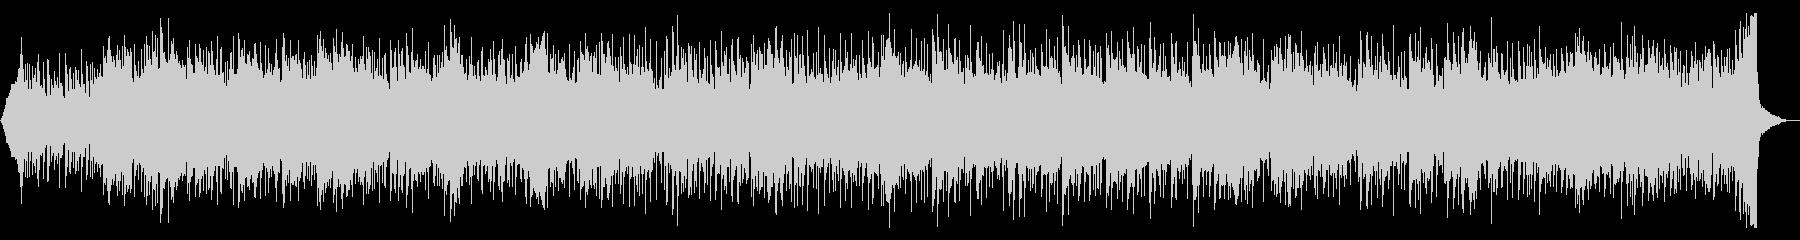 BGM29の未再生の波形